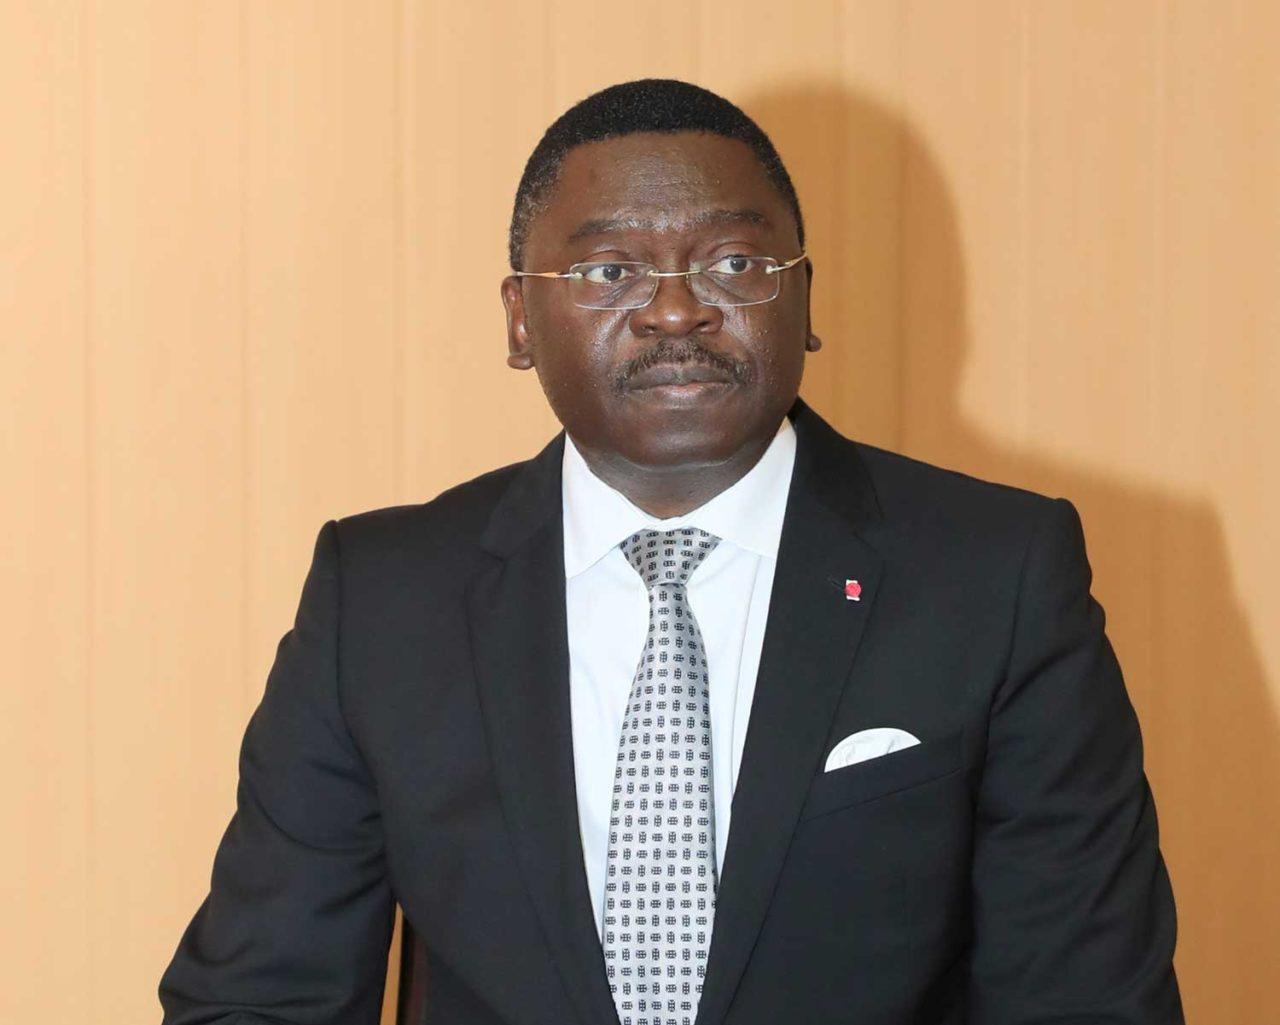 Ministre-Ferdinand-Ngoh-Ngoh-sgpr-cameroun-1280x1025.jpg